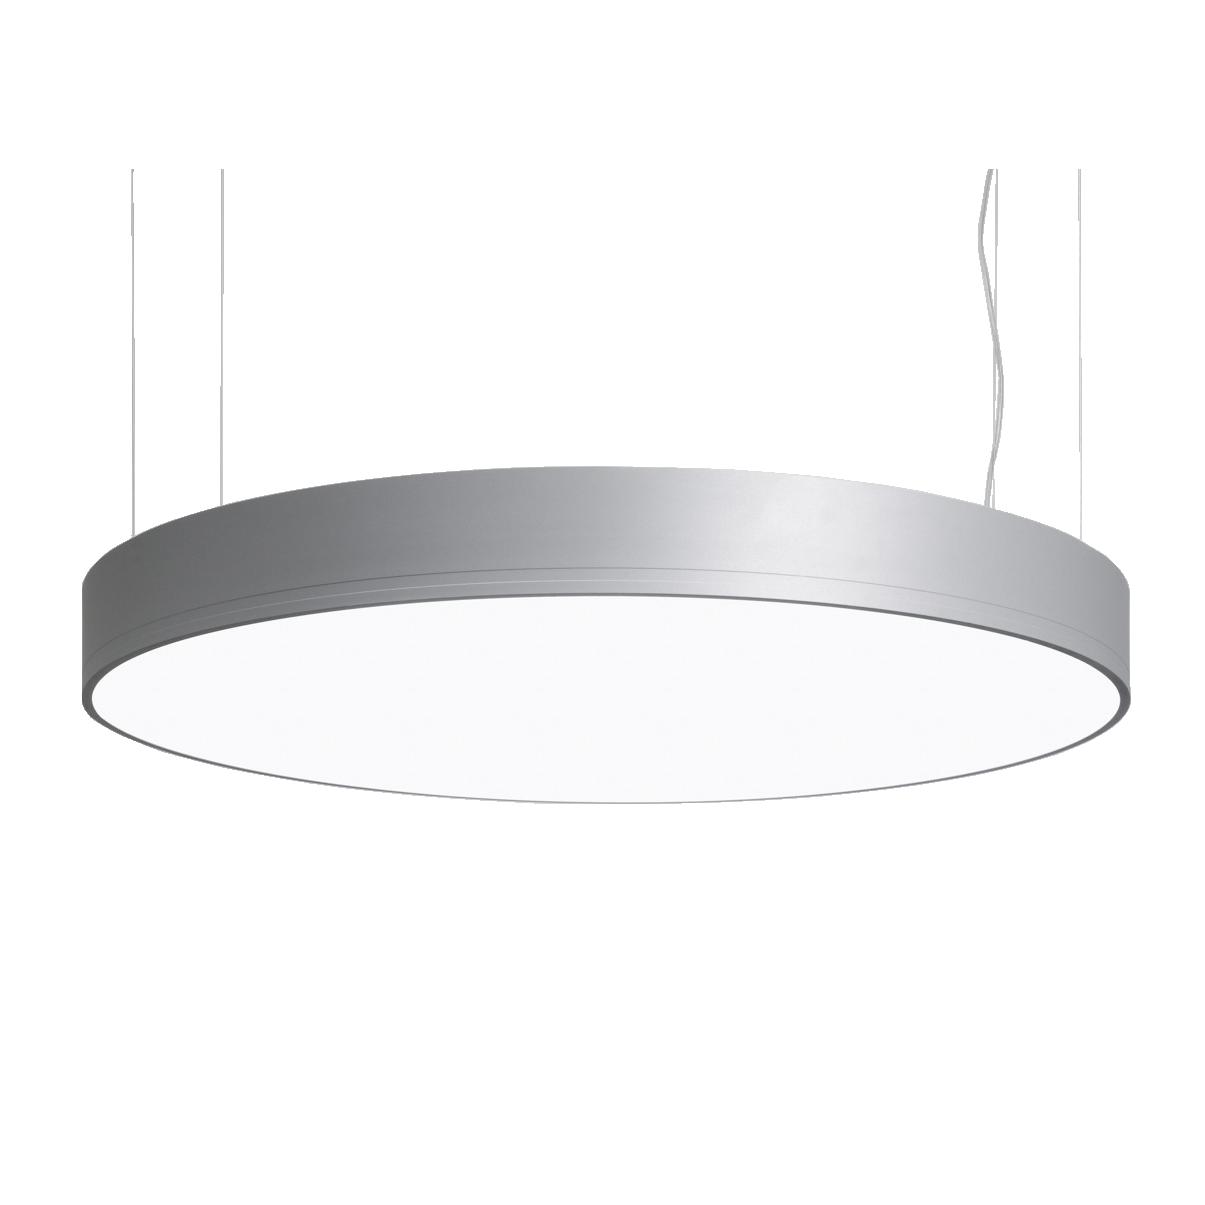 SML LED Anbauleuchte RUN direkt indirekt SML LED